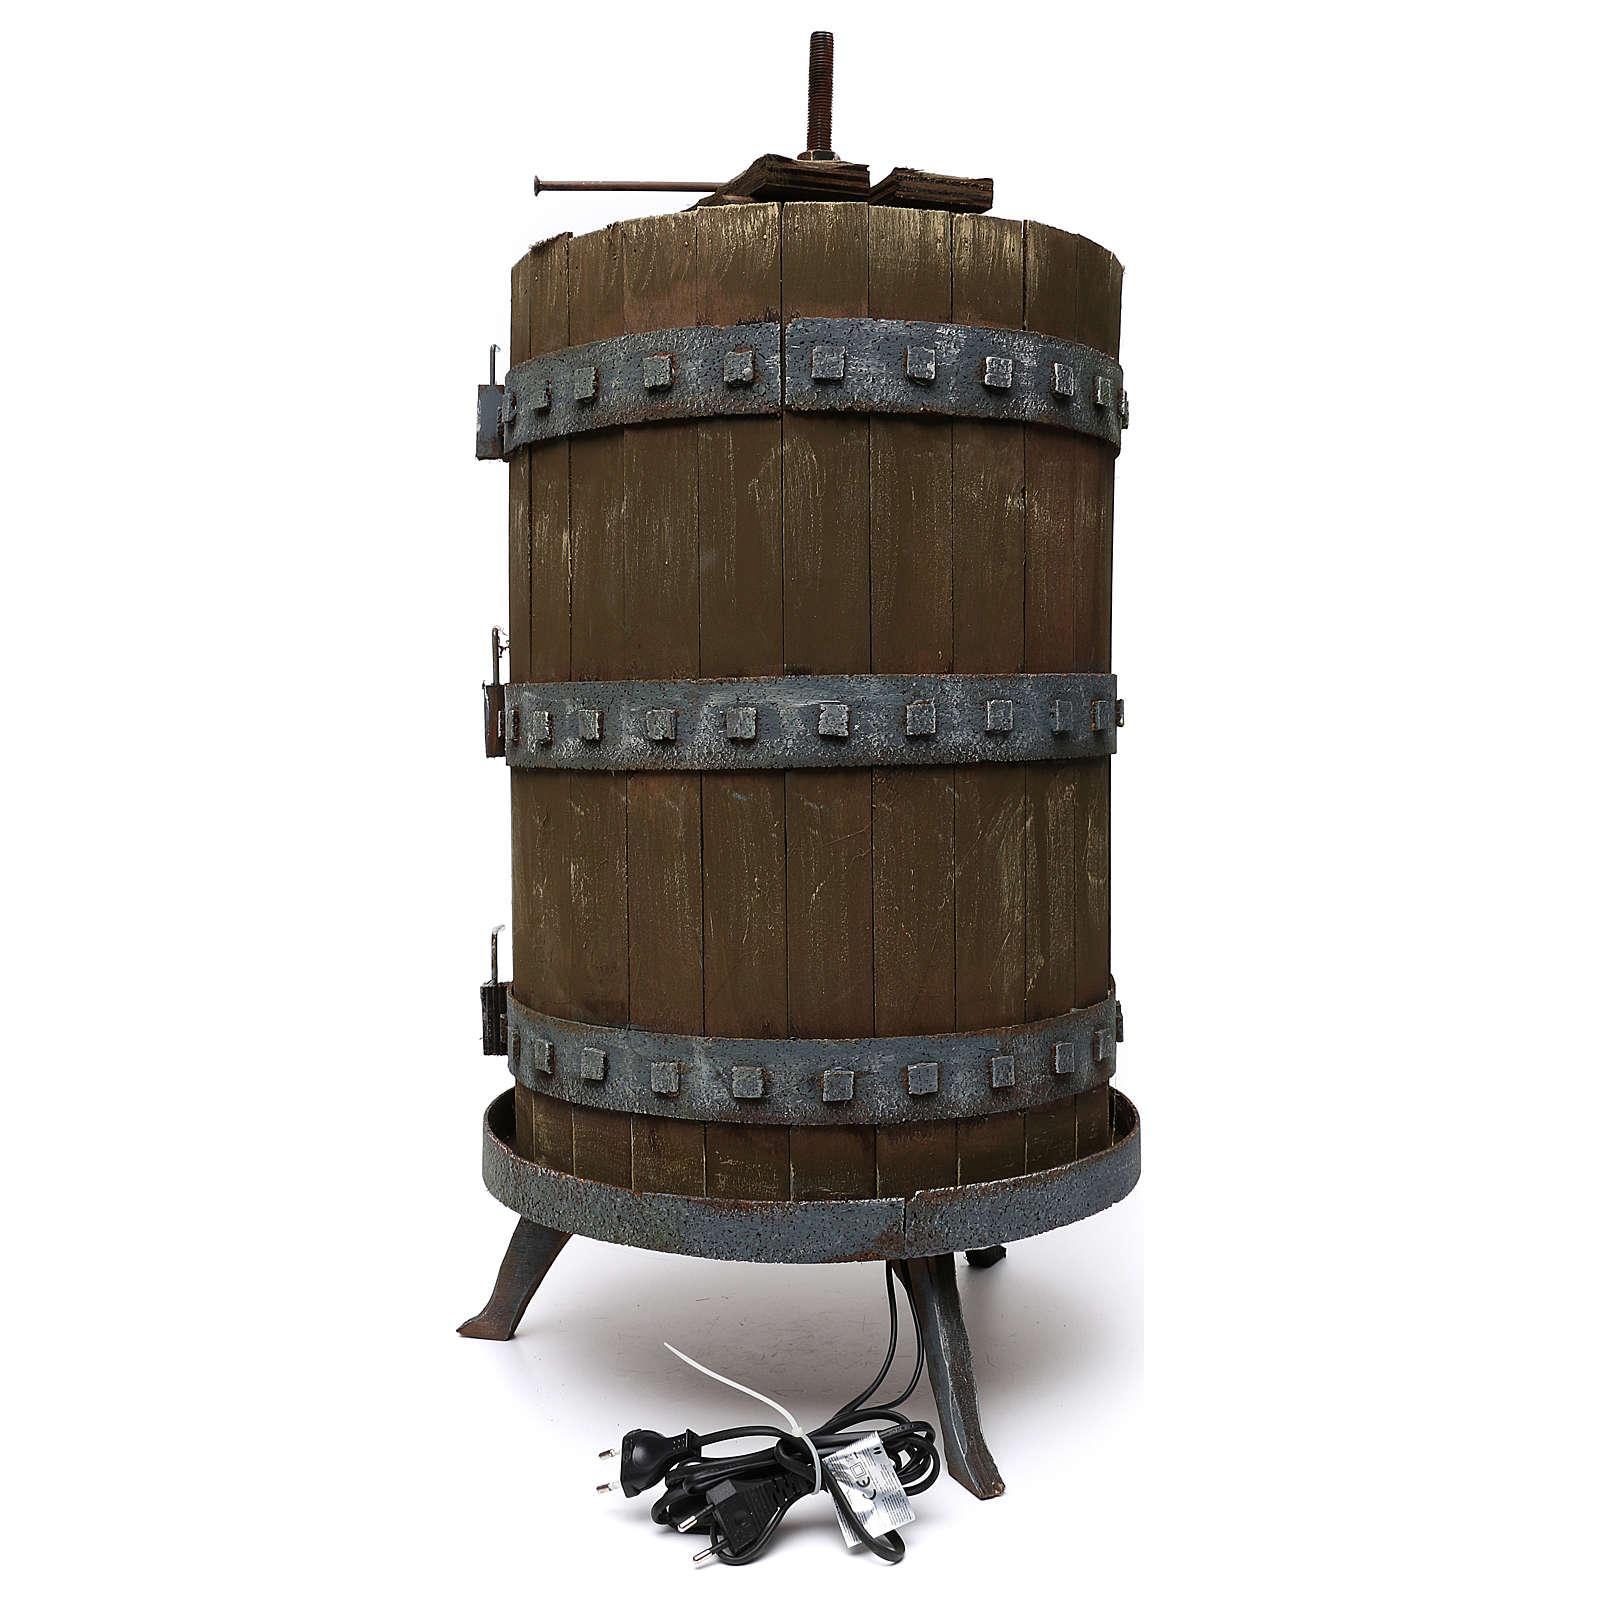 Prensa para vino iluminada 85x45 cm belén iluminado para estatuas 6 cm 4